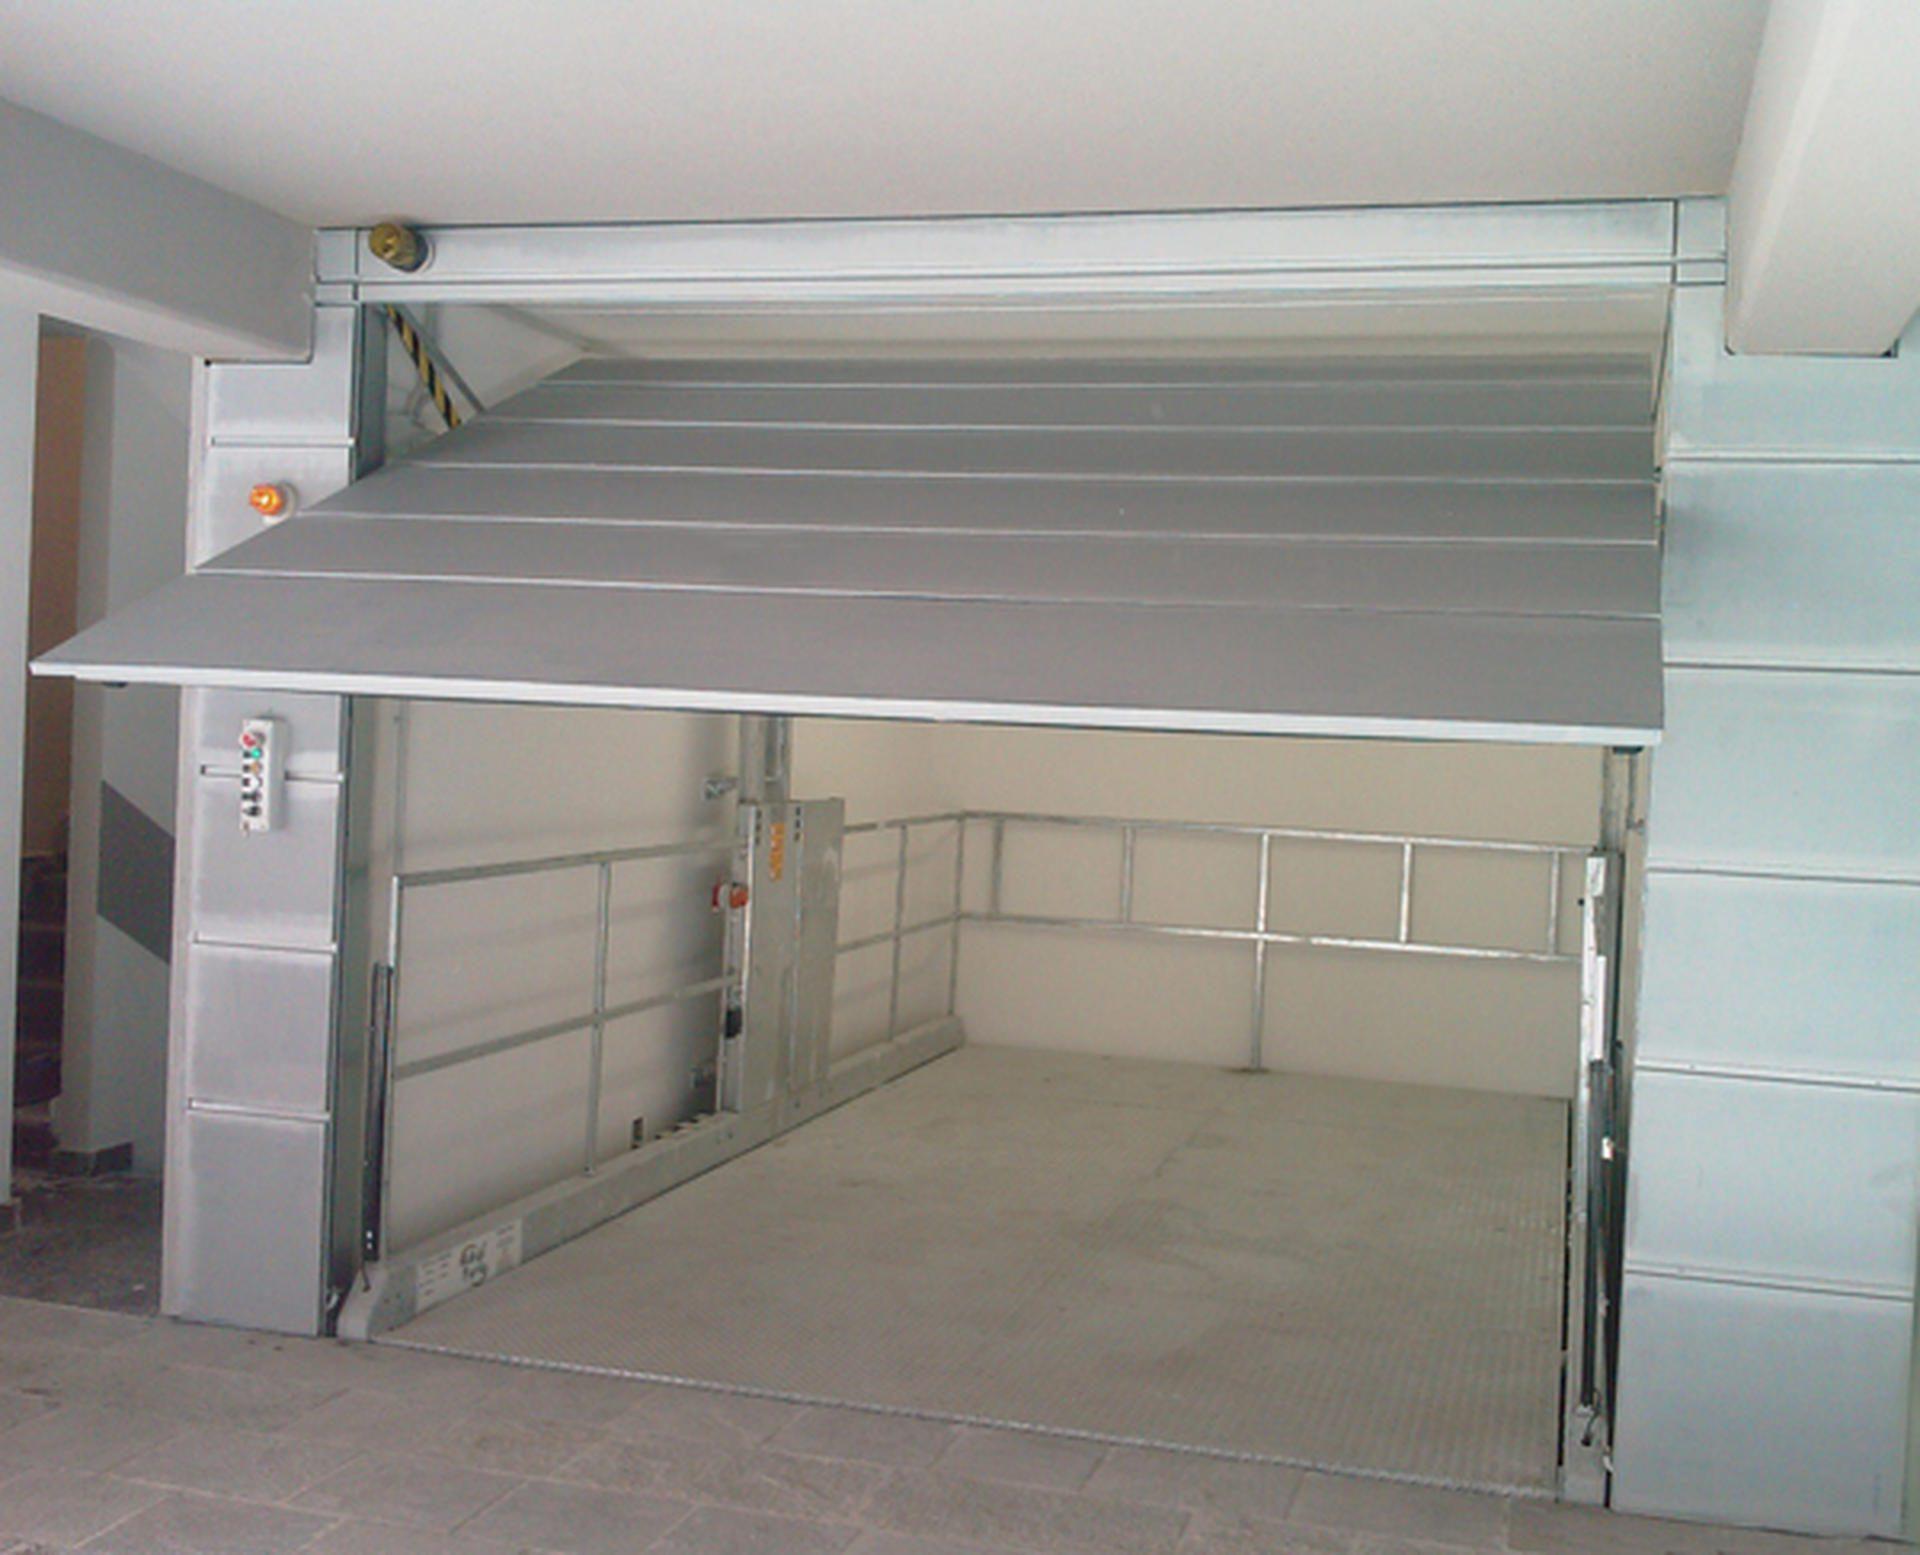 1453130982.01_6.car-lift-IP1-HMT-V03-(11)